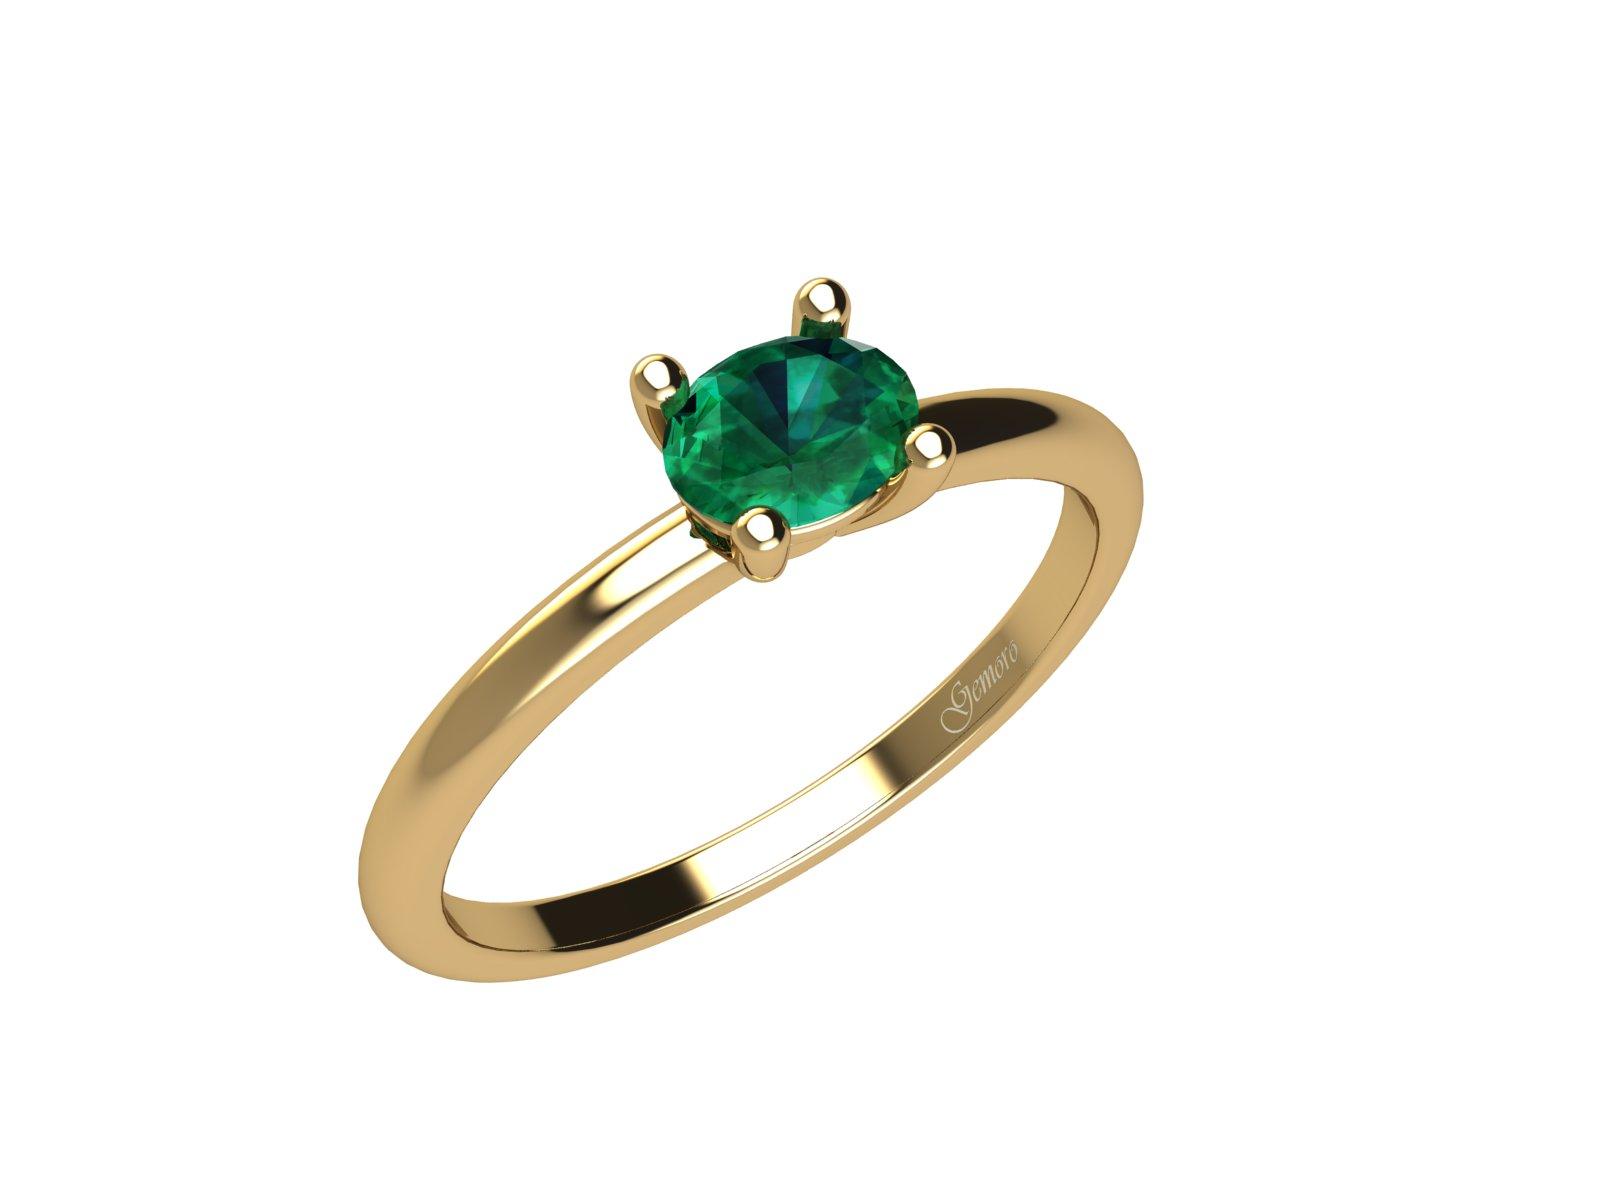 AC401GIA.SM – Anello in oro giallo 18kt con Smeraldo Naturale